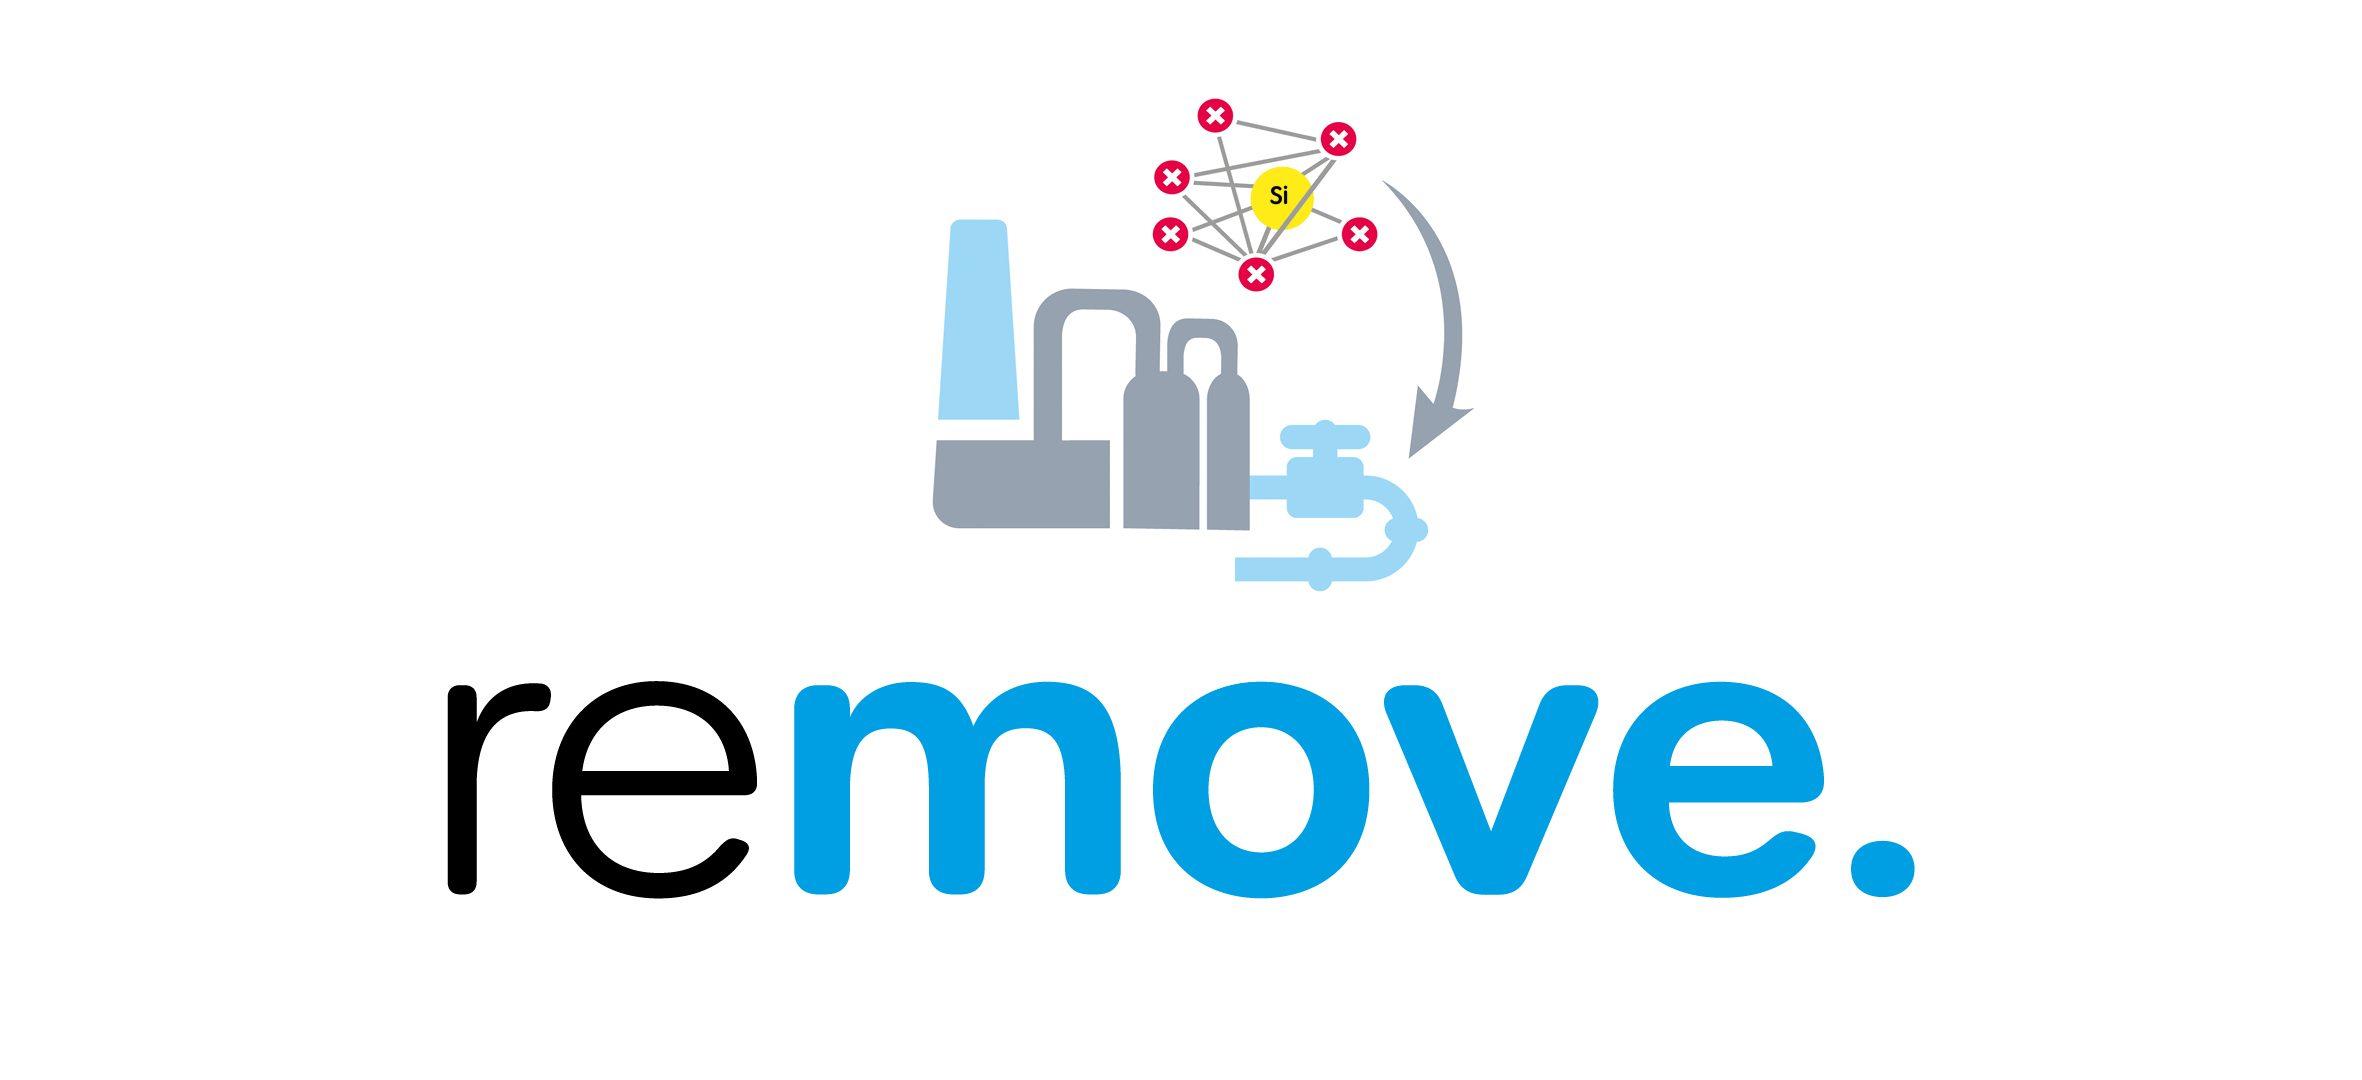 Removal of microplastics